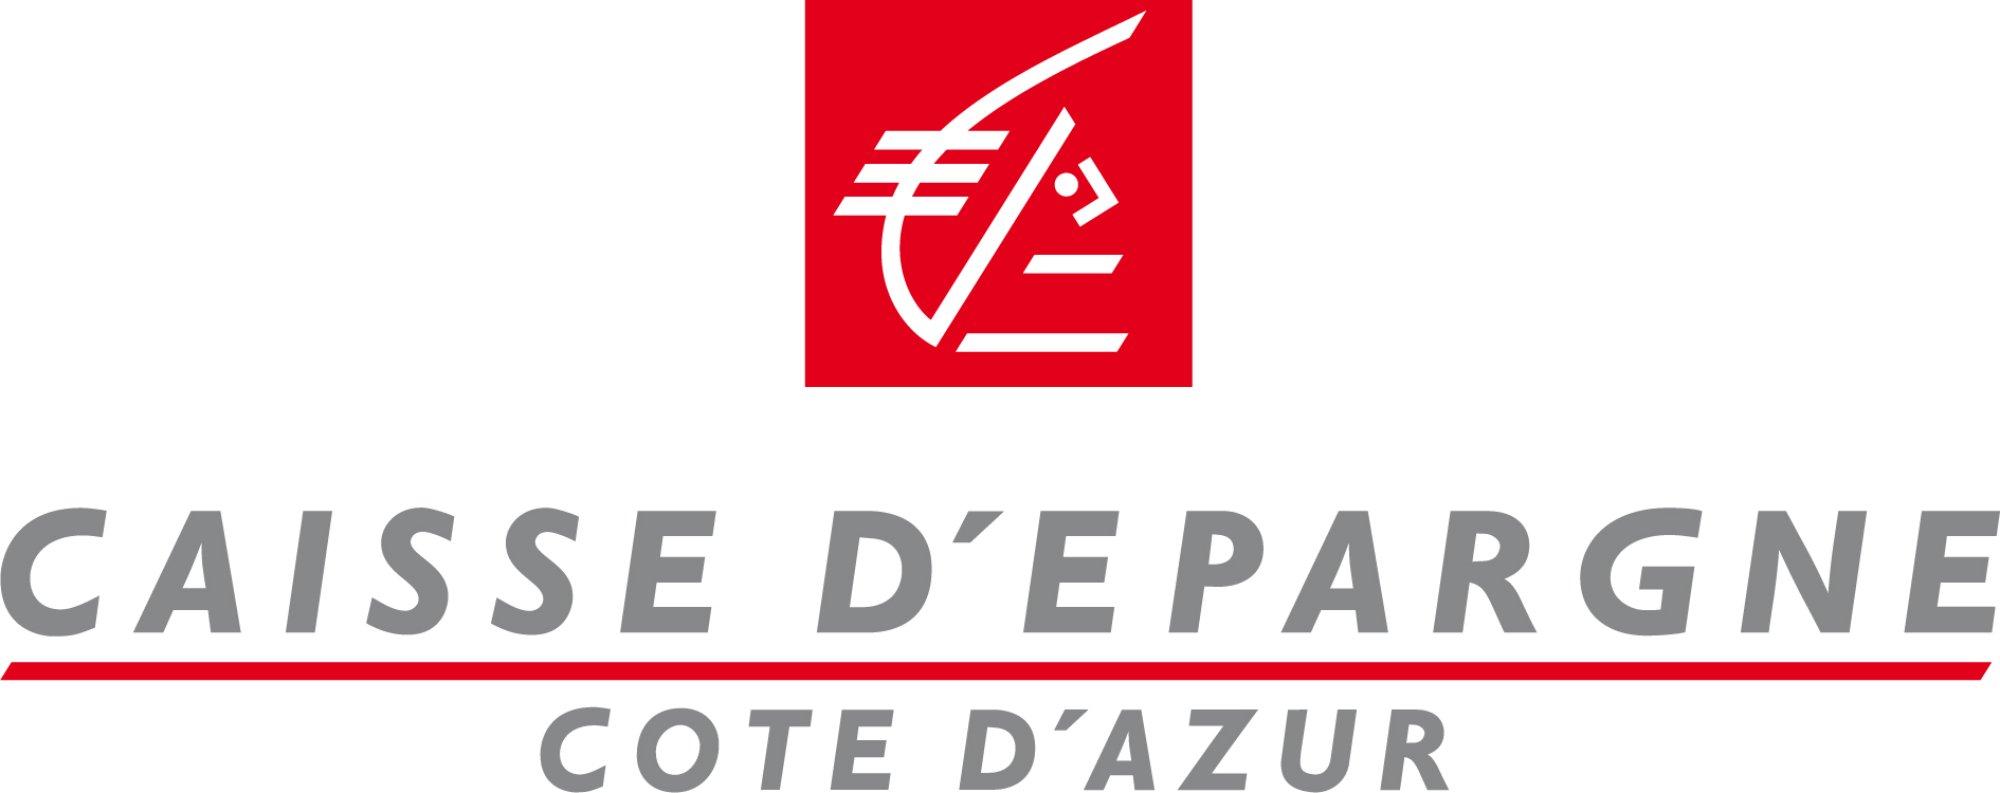 Formation en Alternance Caisse d'épargne Nice